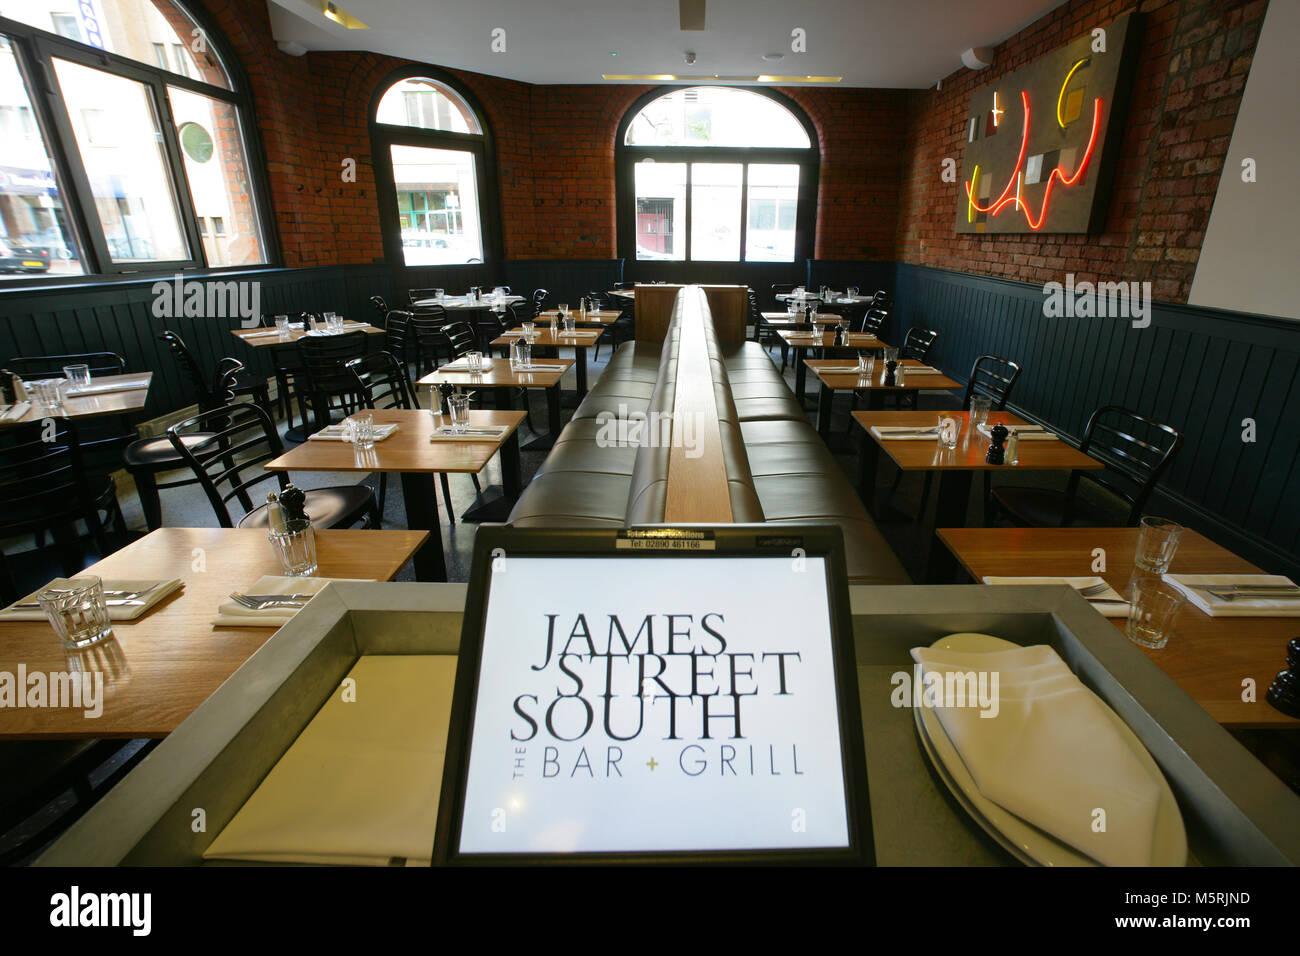 The Bar and Grill, 21 James Street South, Belfast, BT2 7GA. Photograph/Paul McErlane - Stock Image